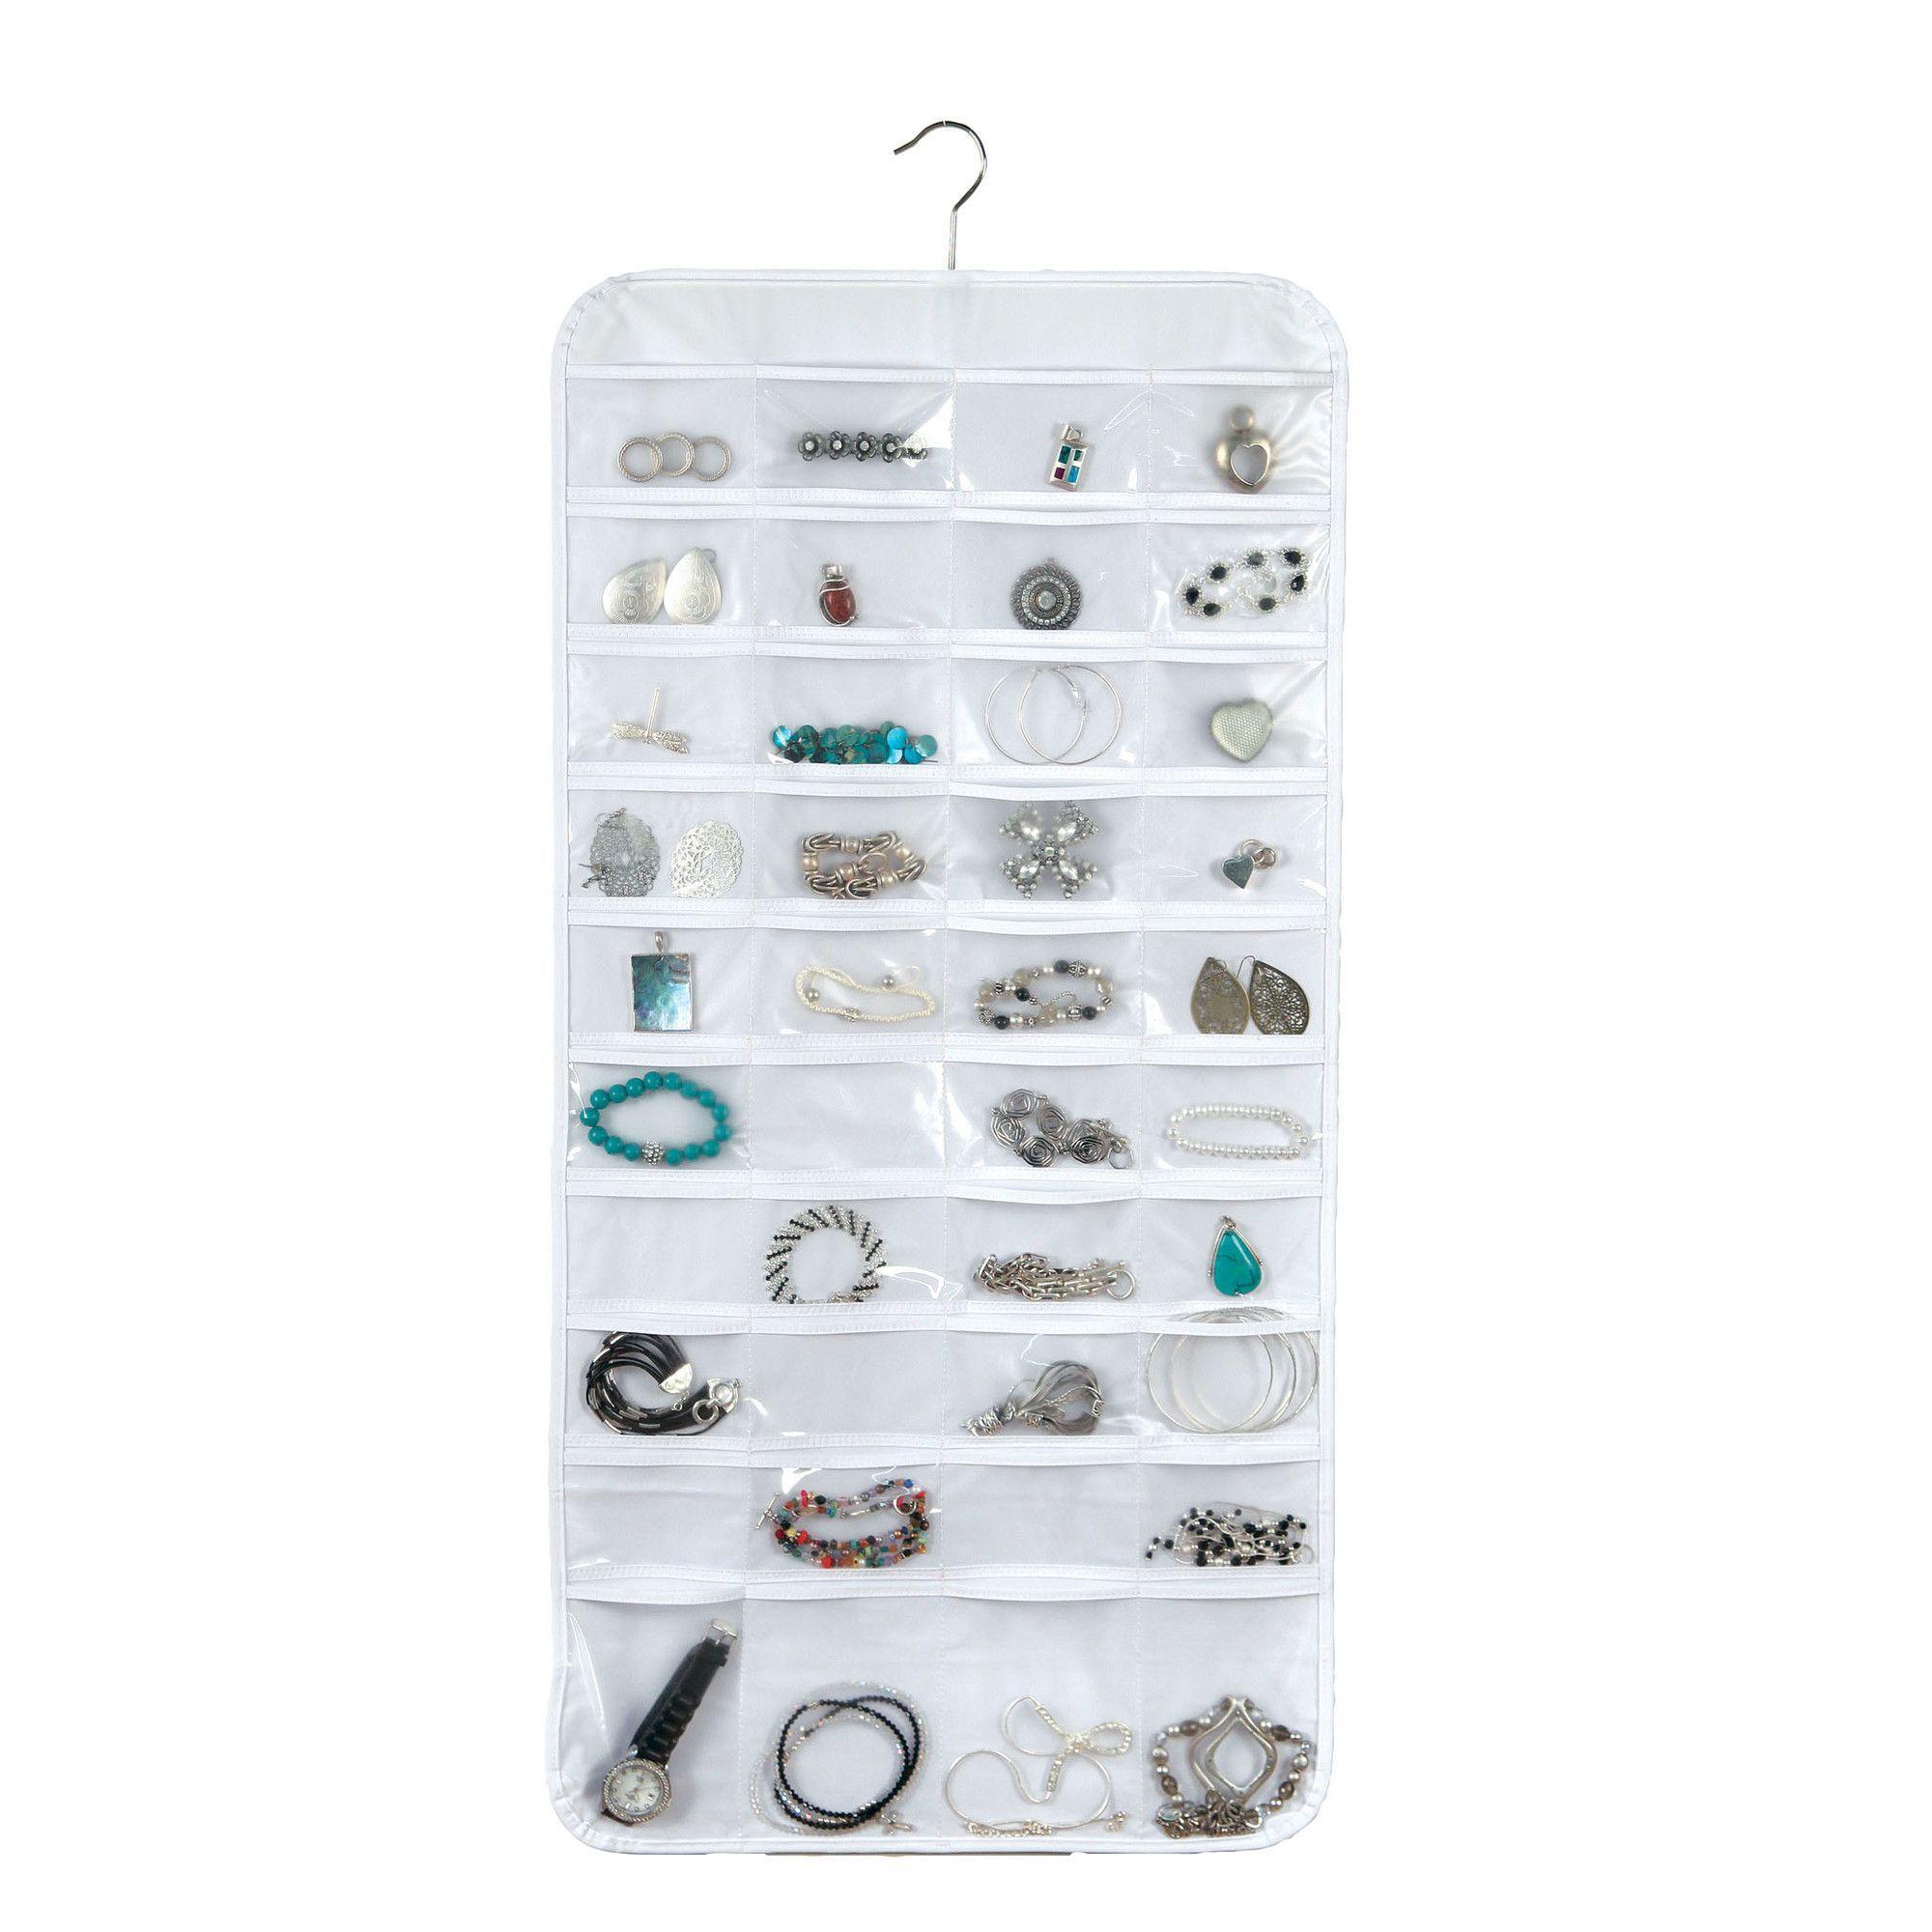 Richards Homewares 80 Pocket Wall Mount Jewelry Holder Bracelets